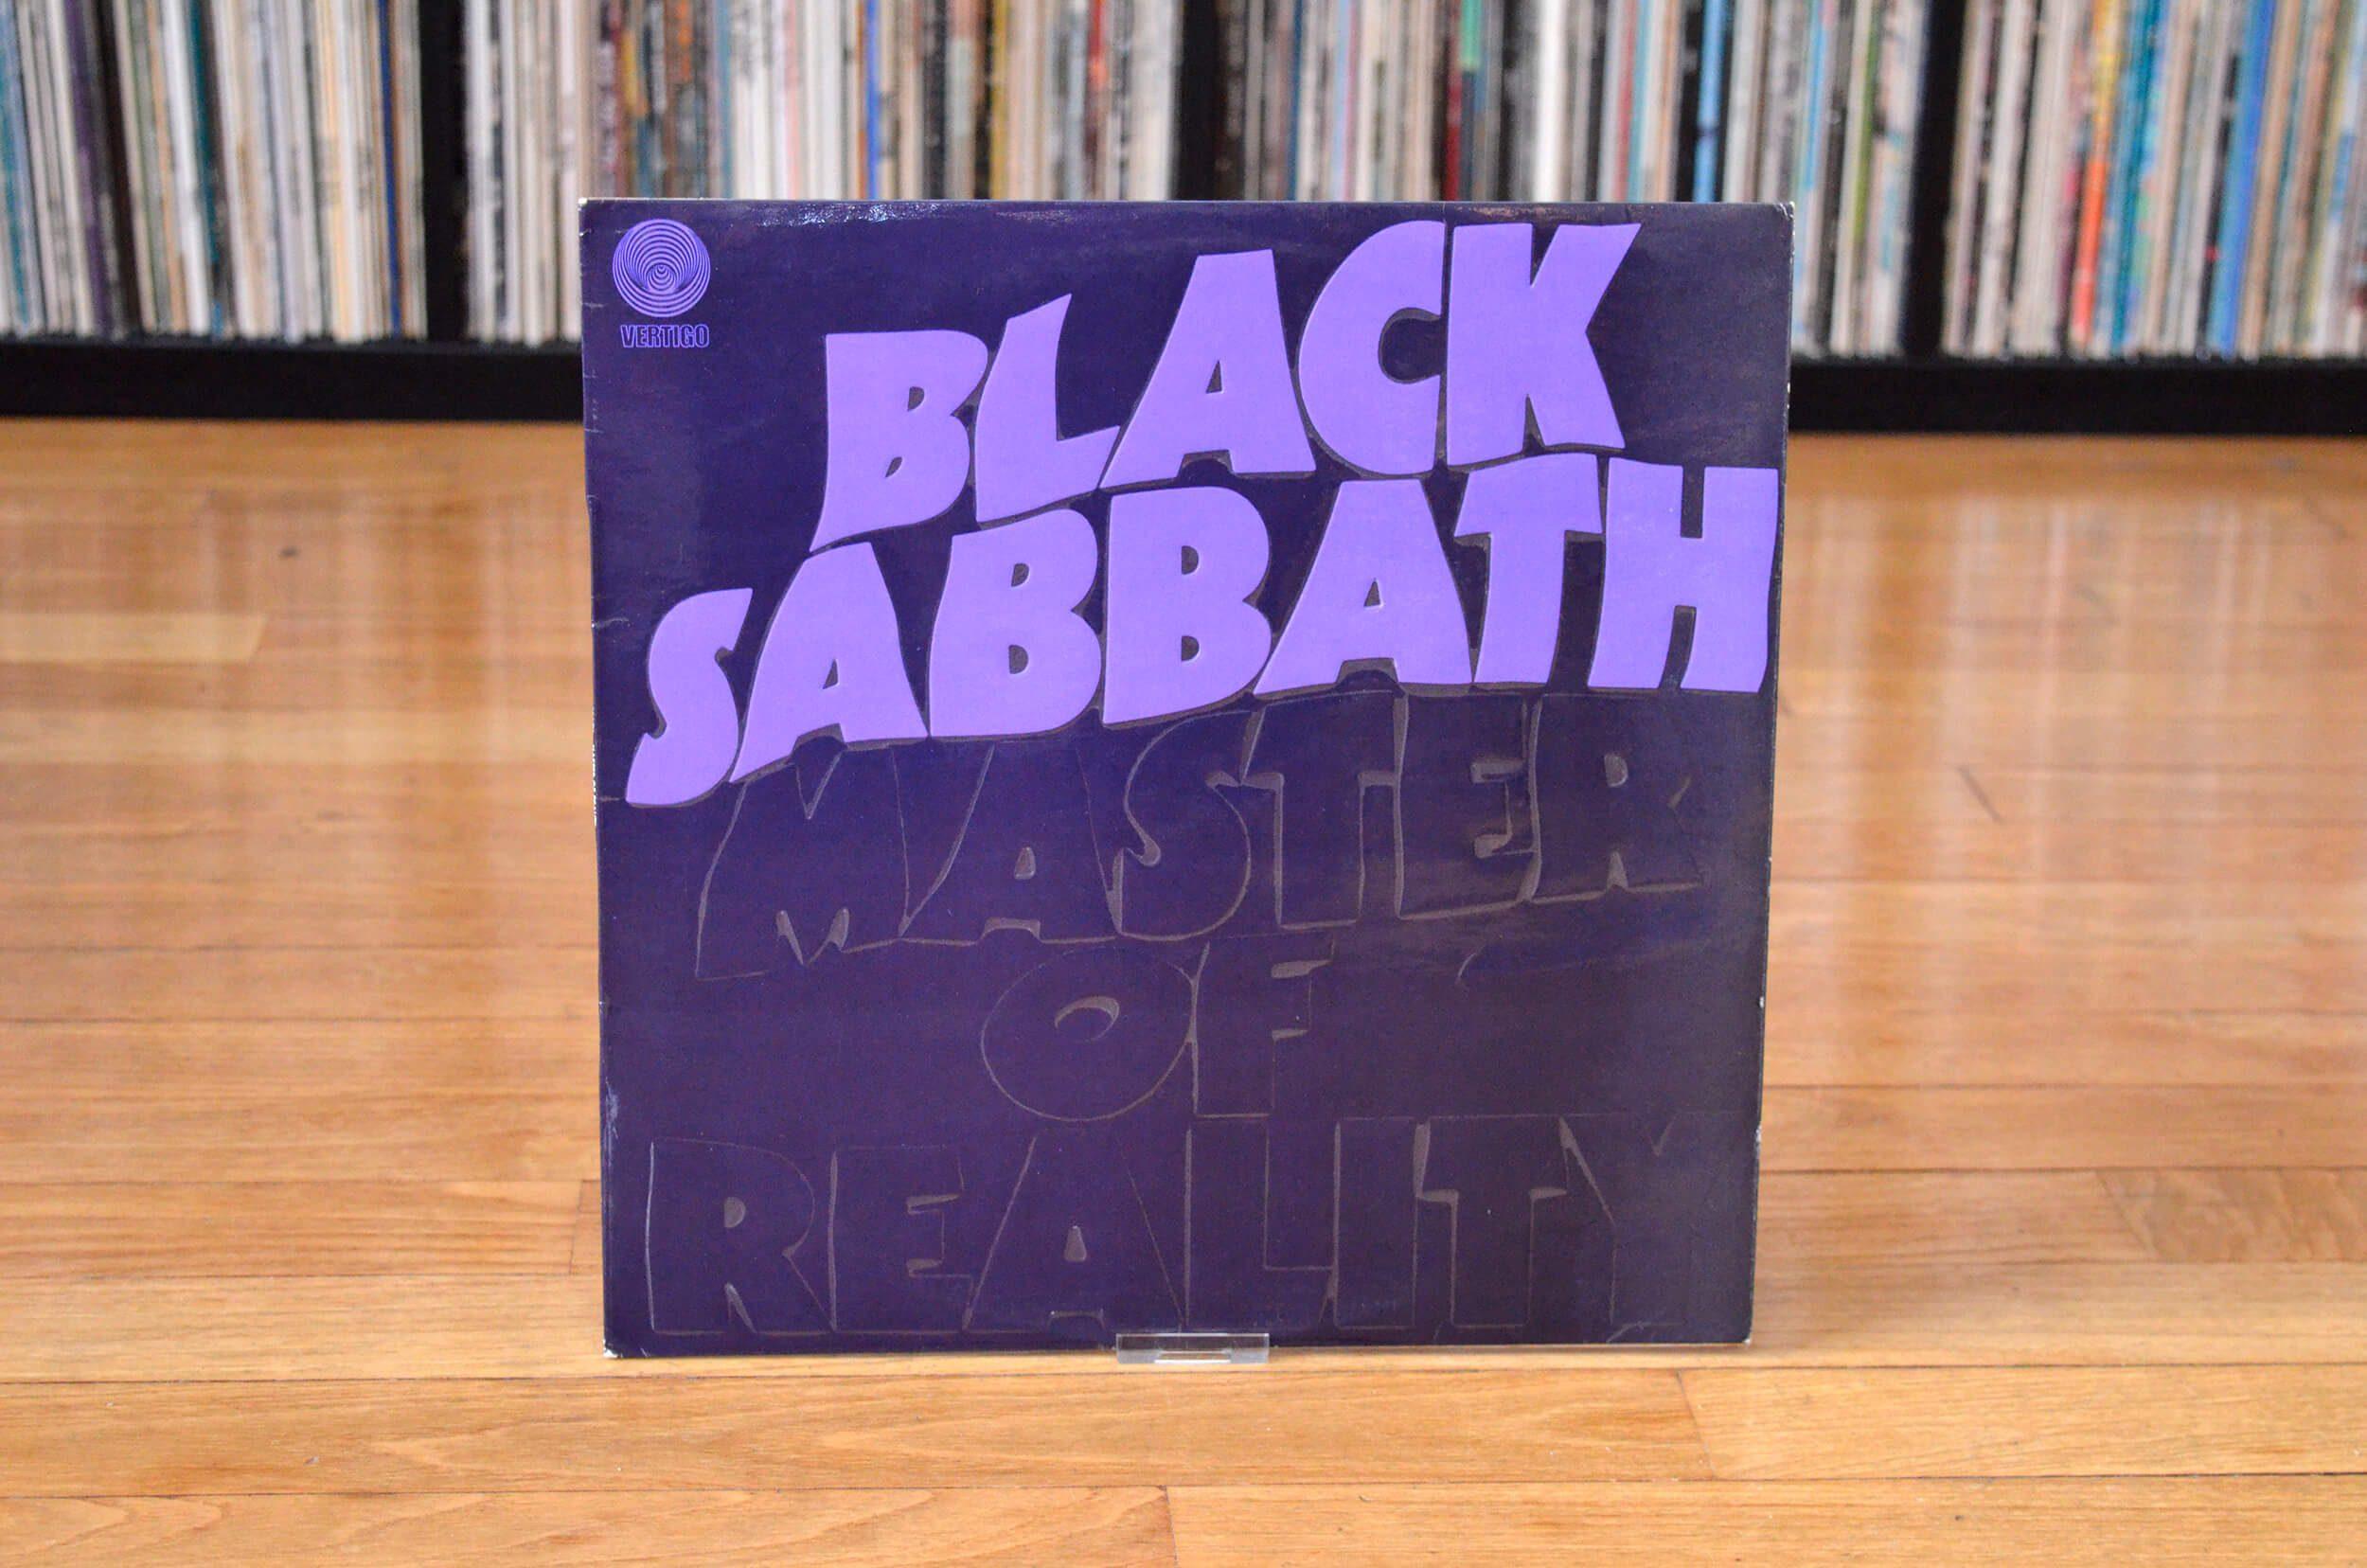 Black Sabbath - Master Of Reality